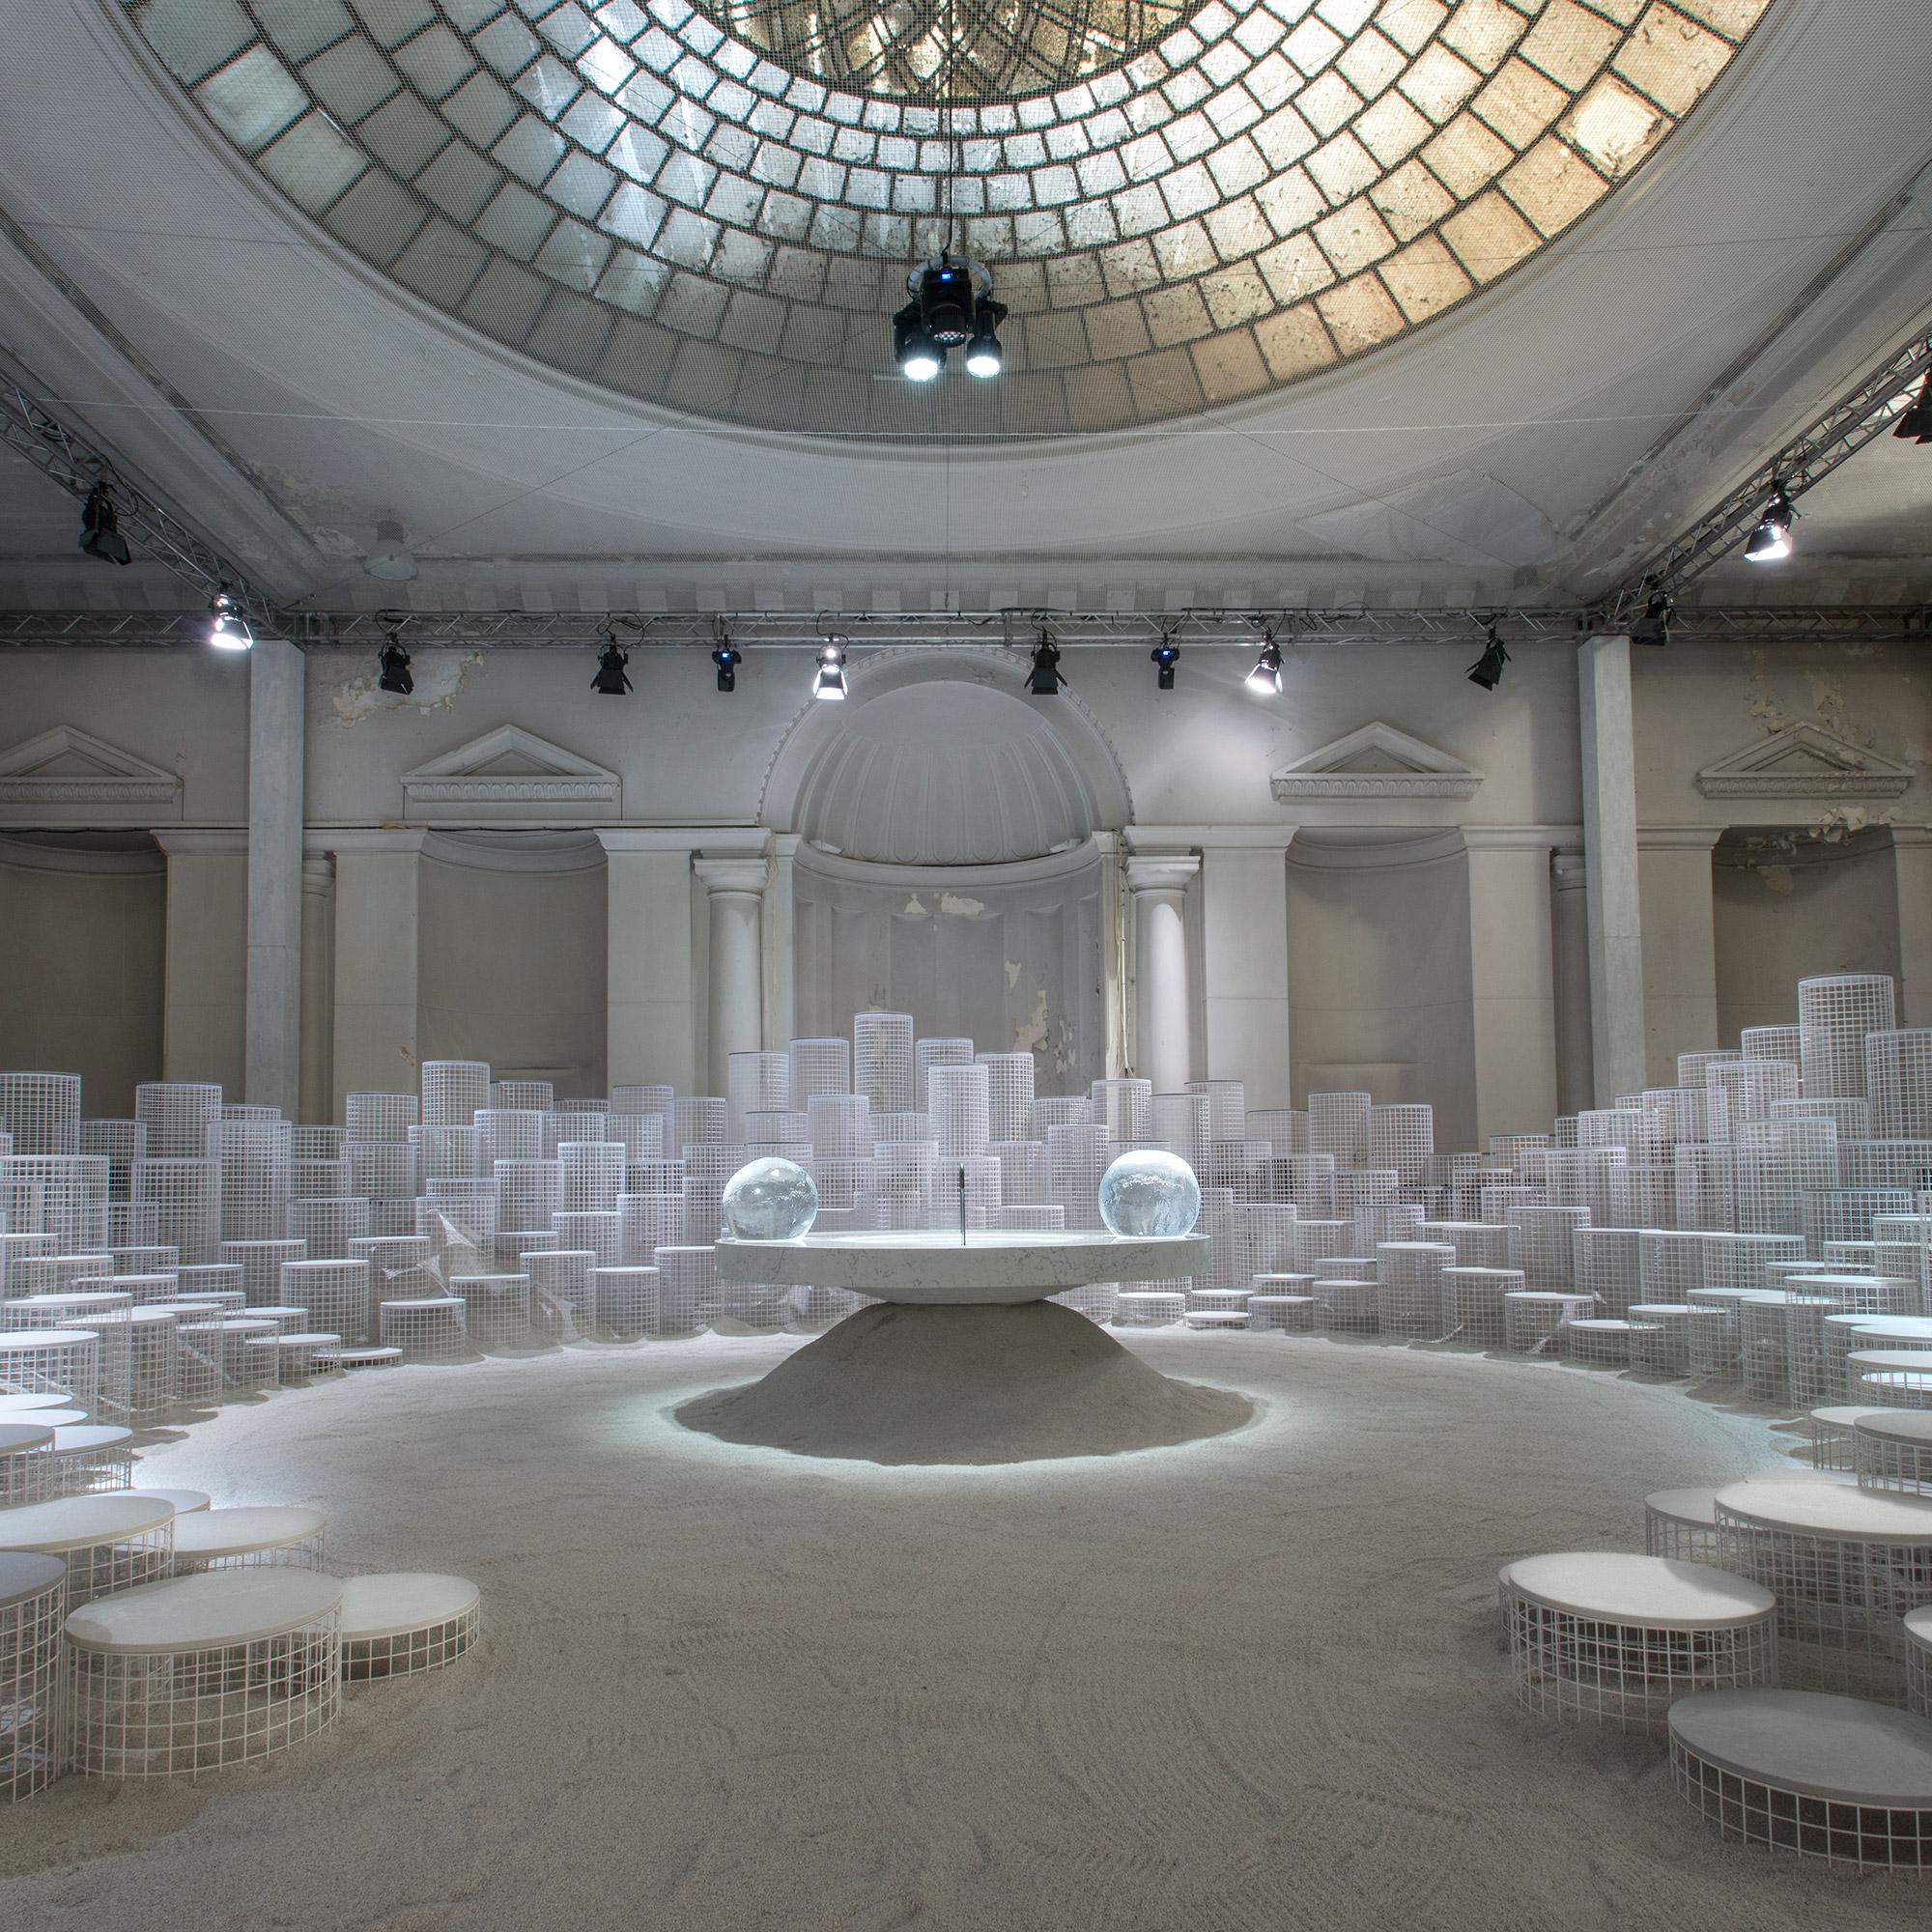 milan design week's most impactful installations